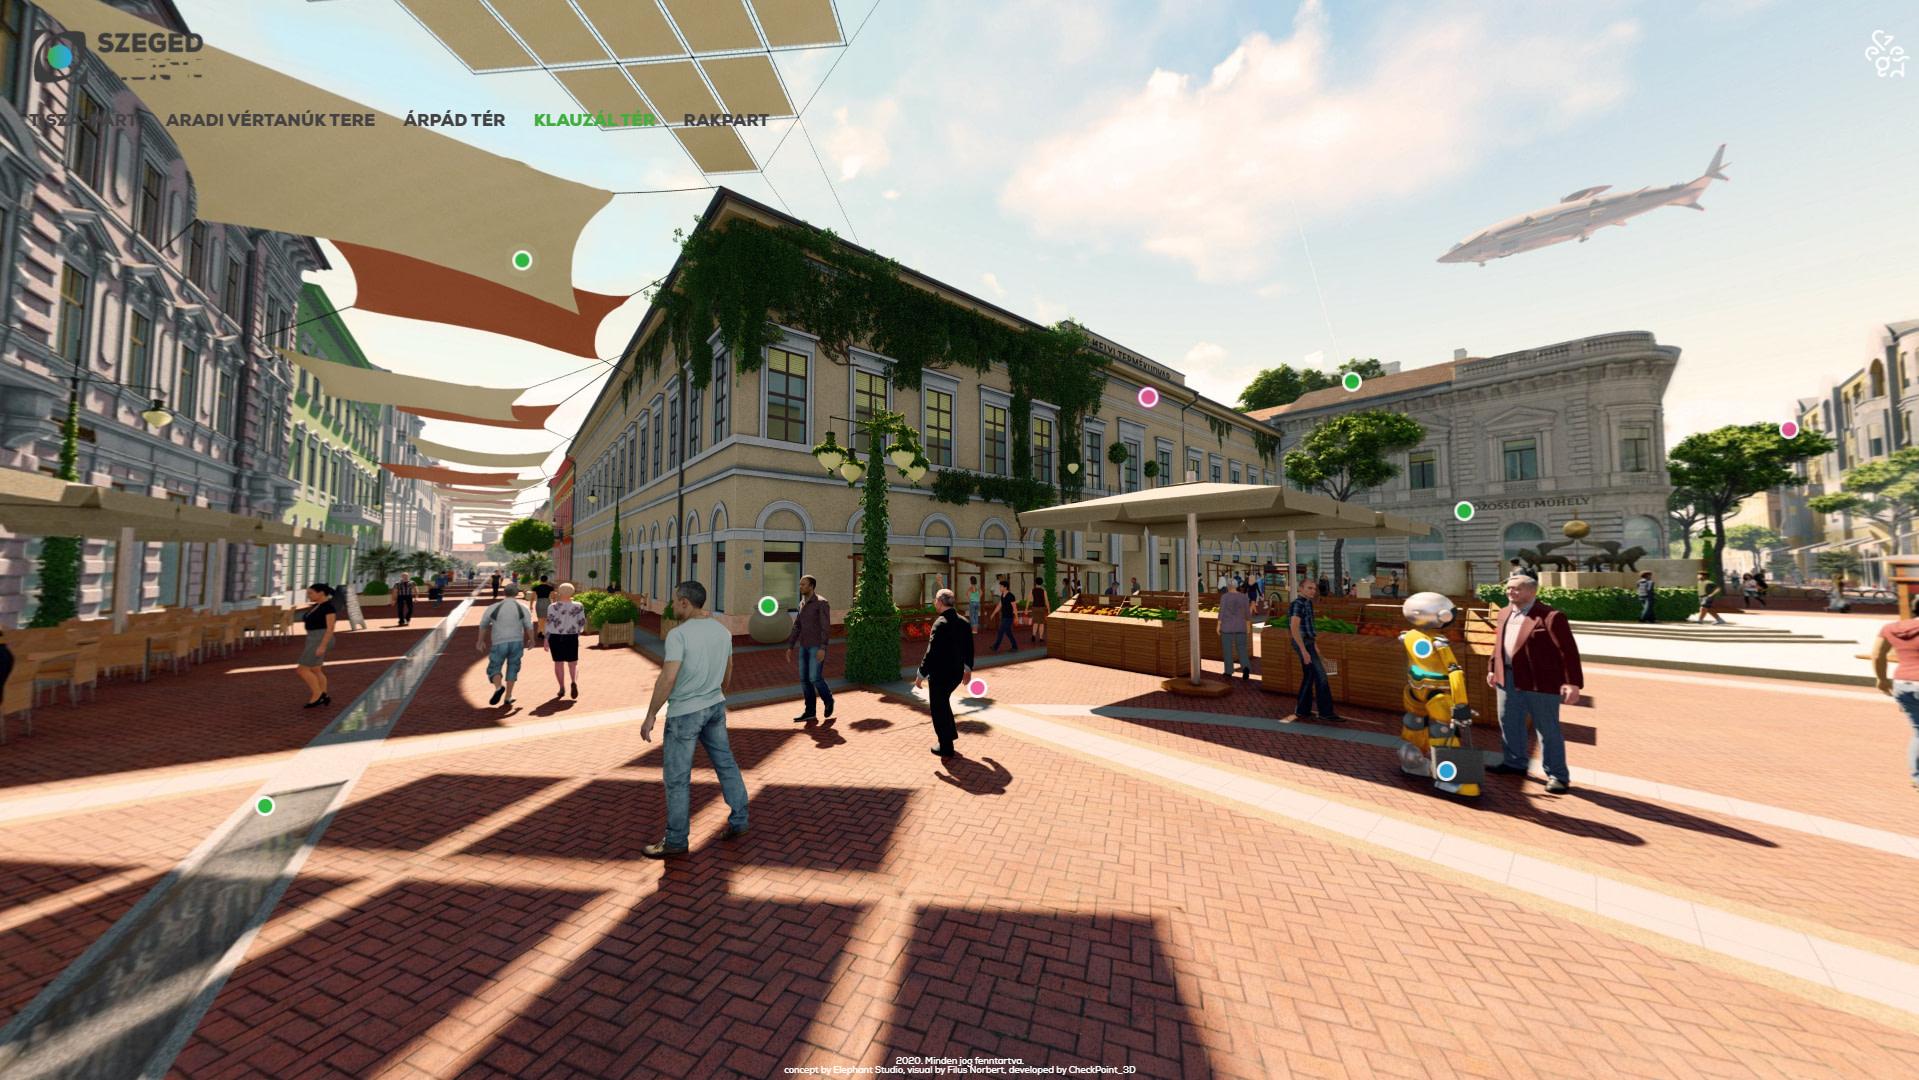 Szeged Vision 2050